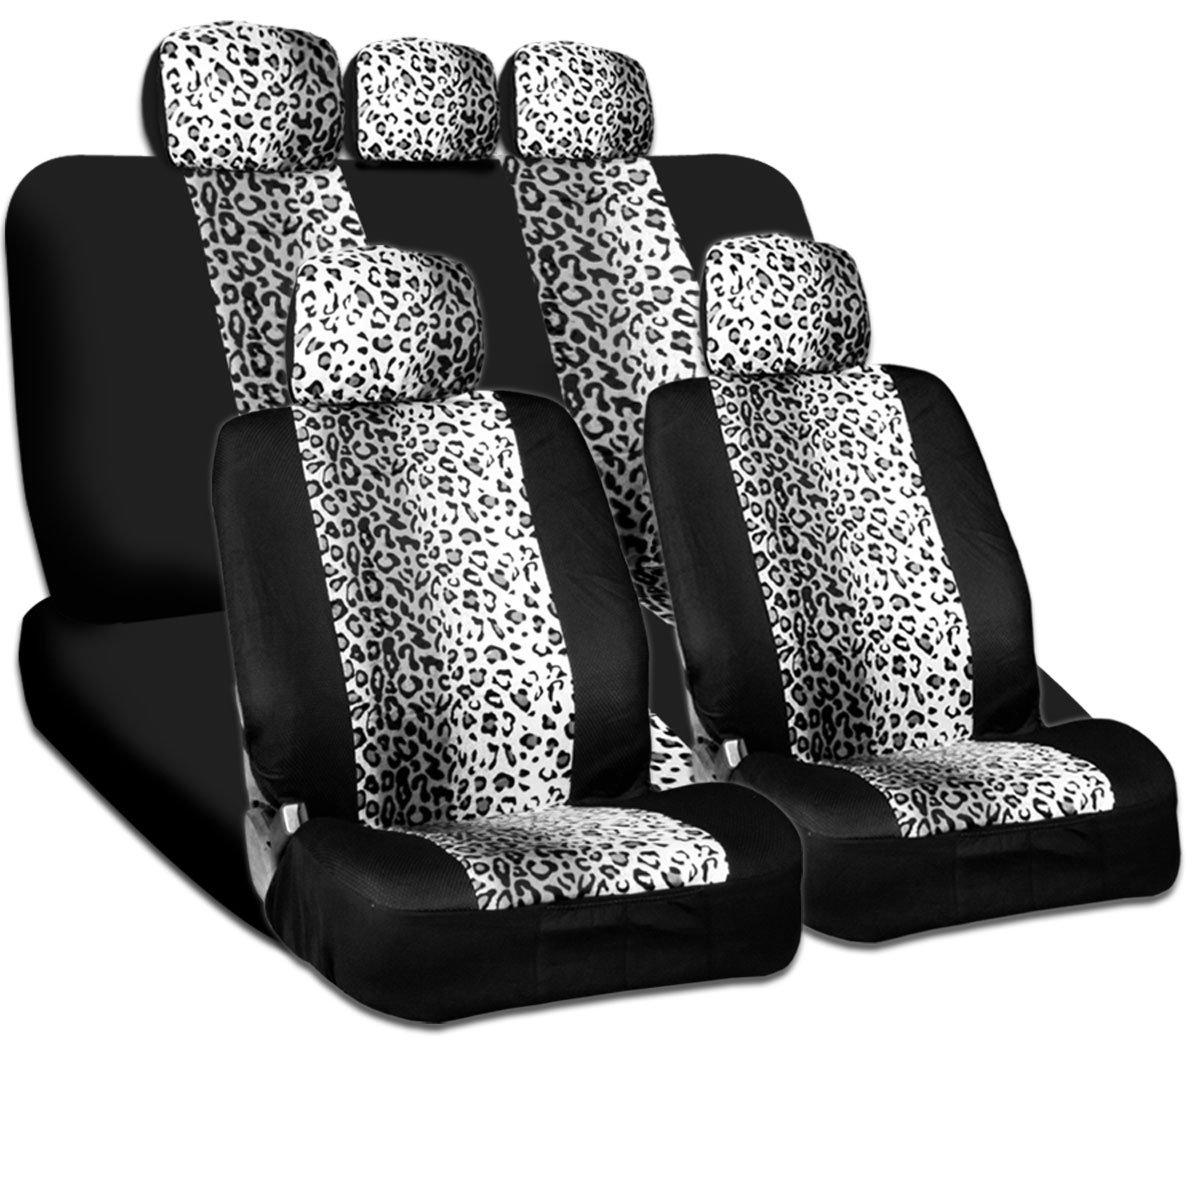 Pu Leather Sofa Images Incredible White Sleeper